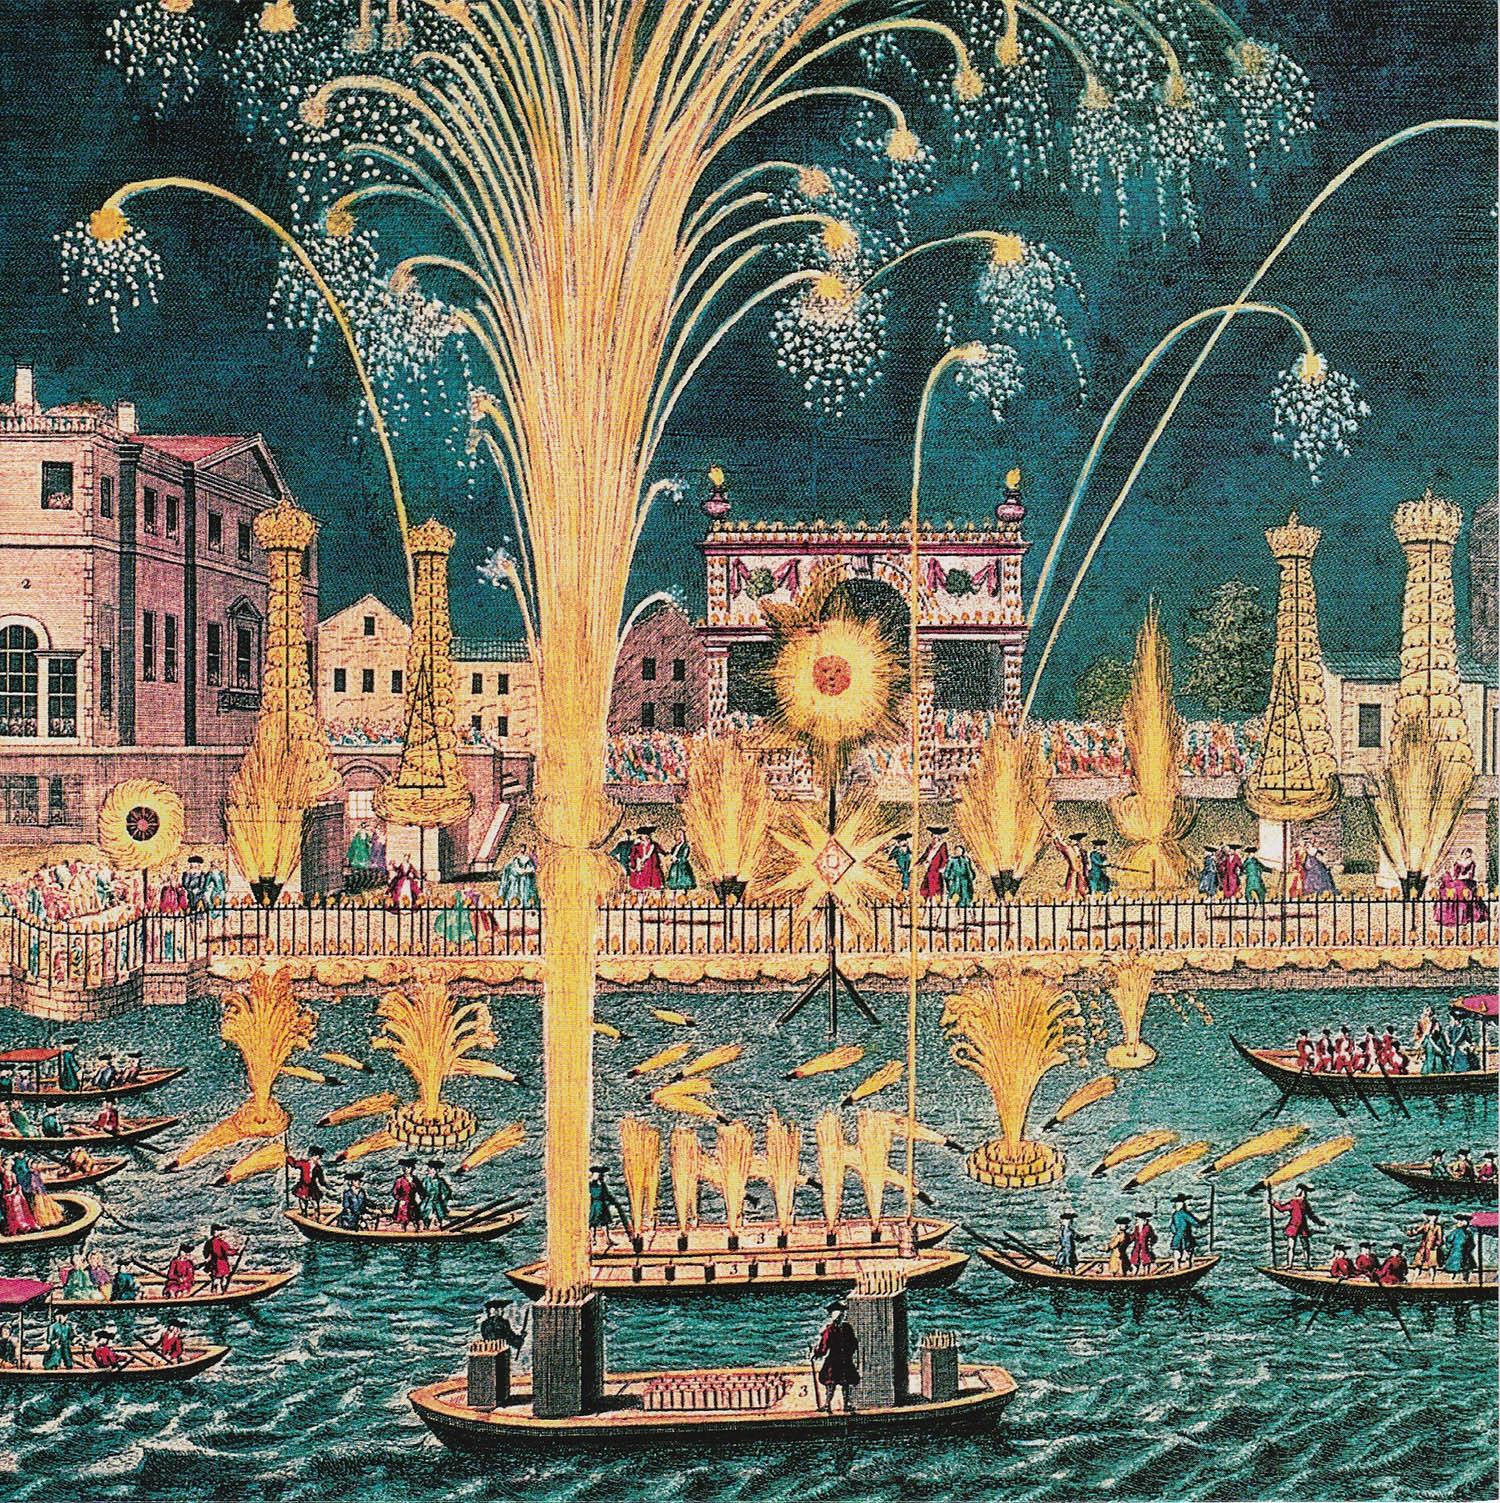 fireworks-illuminations-london-1748-mus-gall.jpg